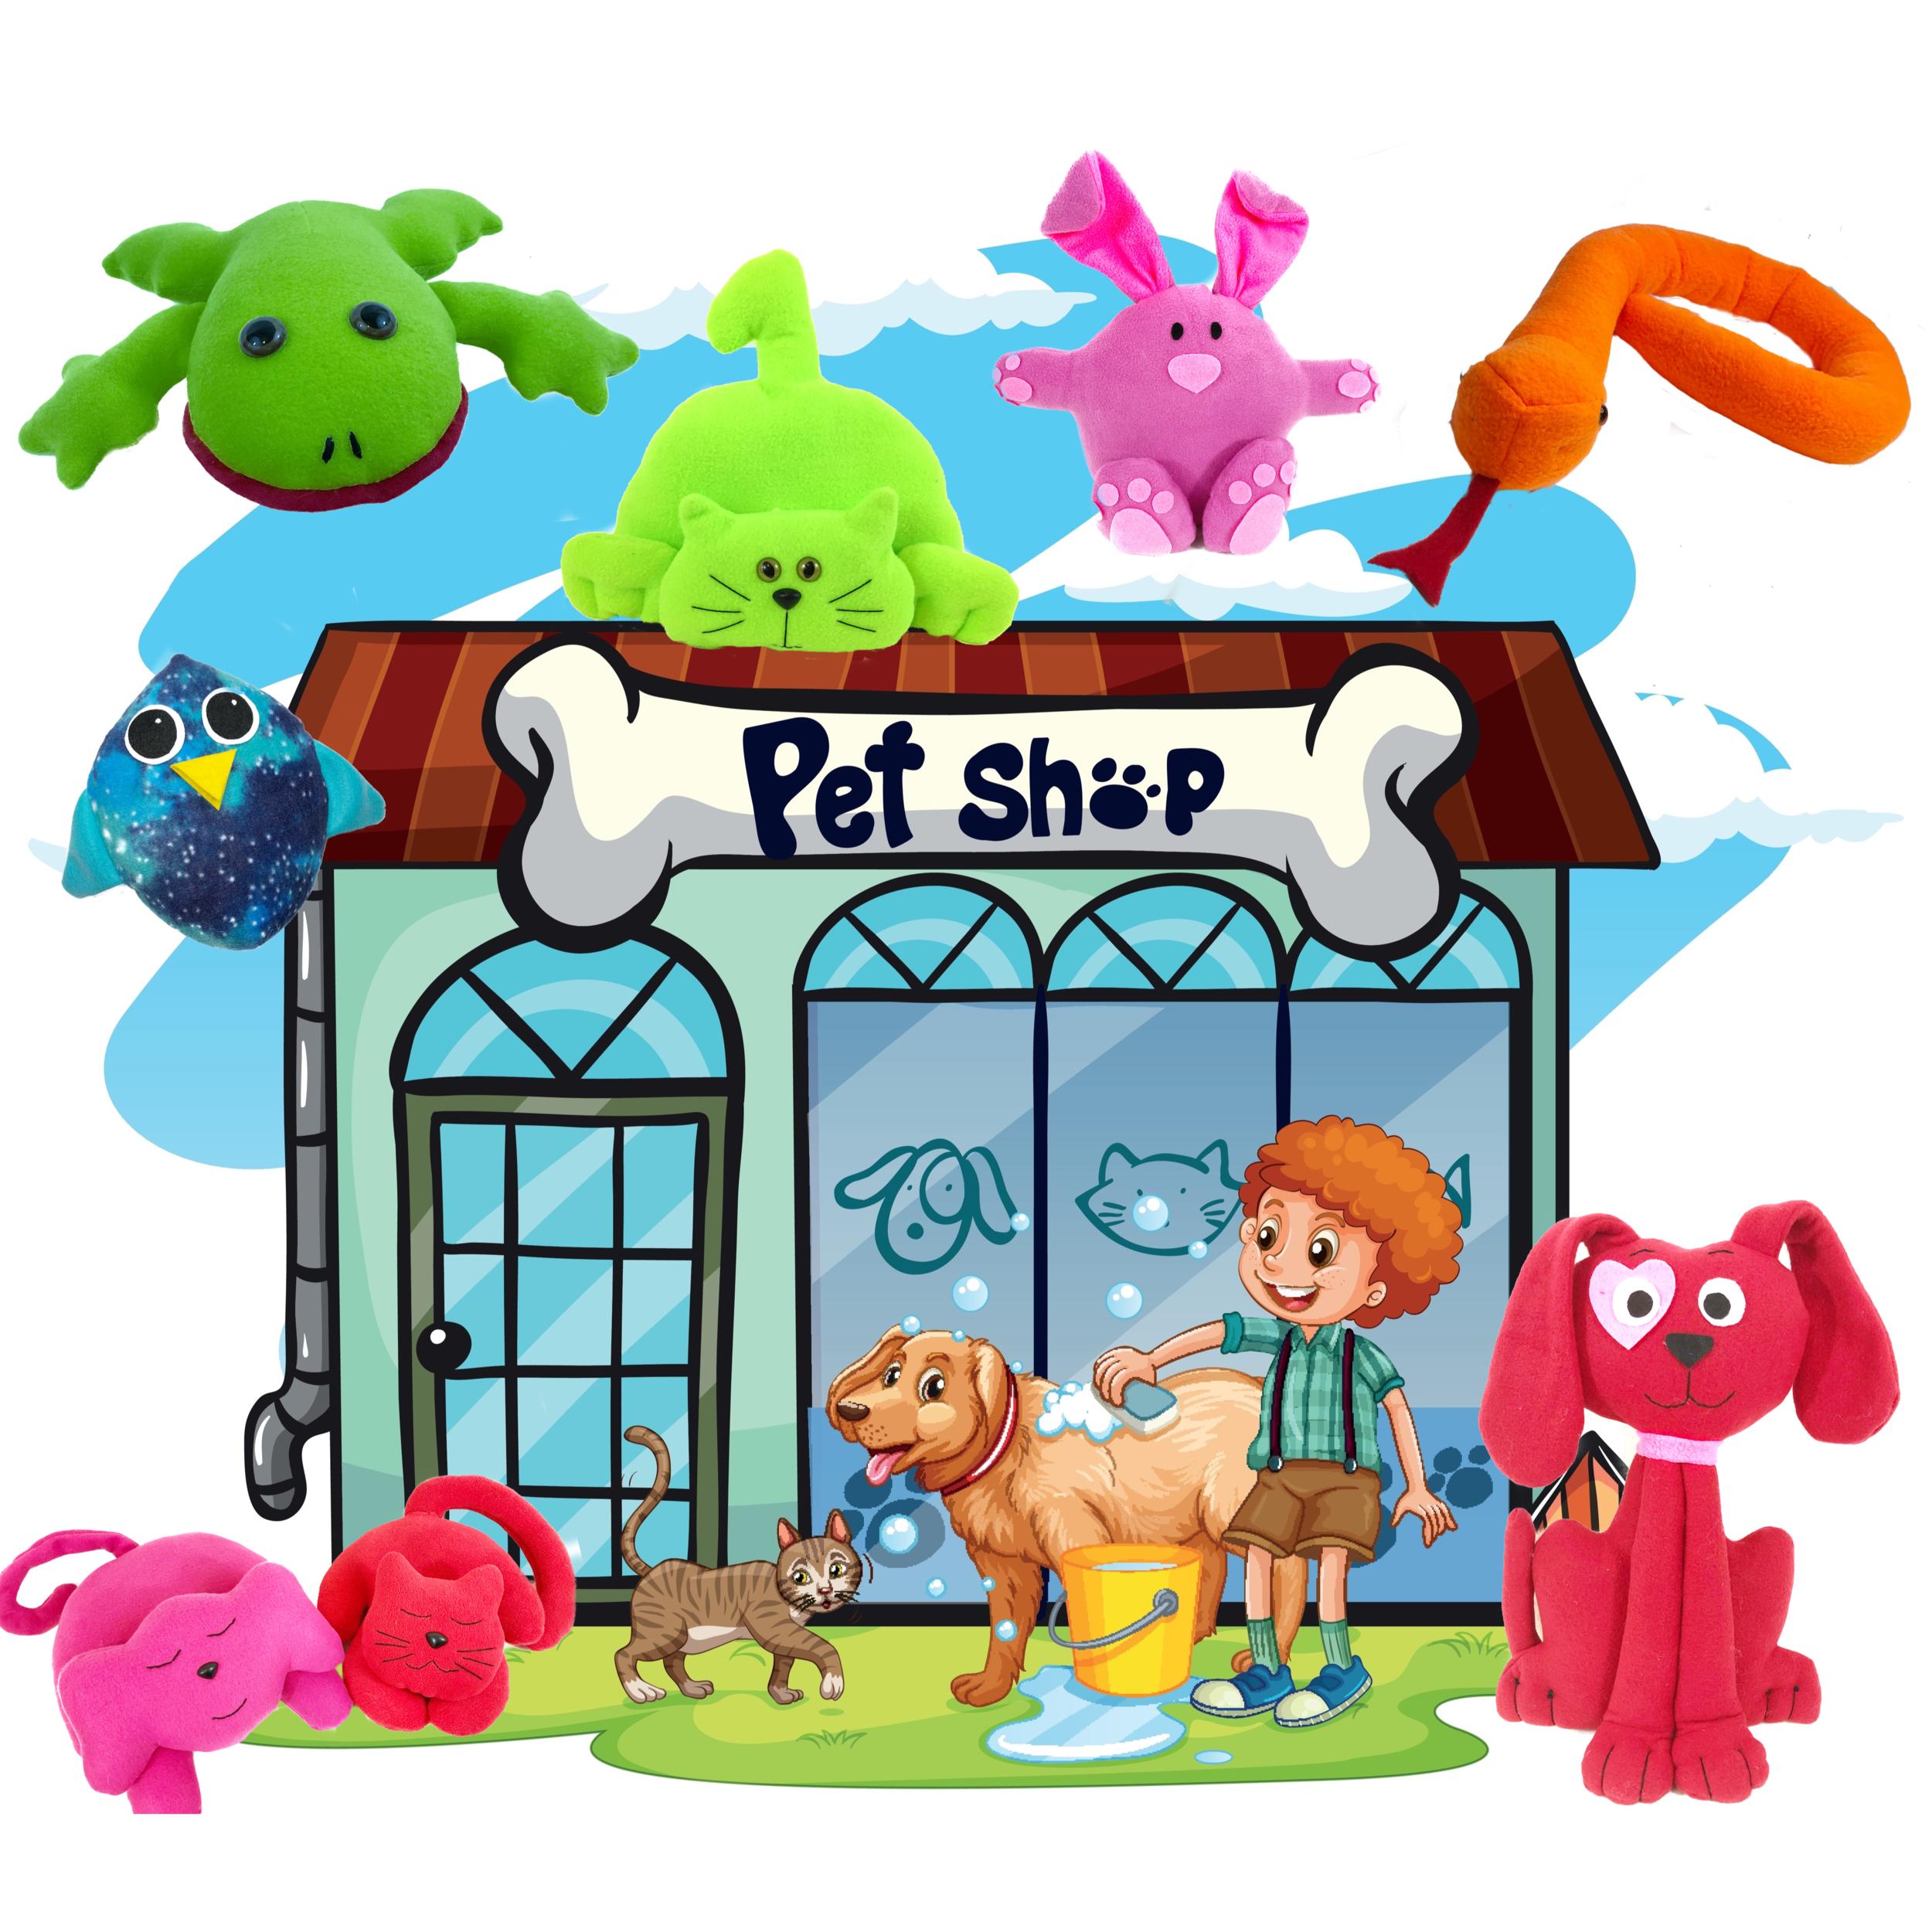 DIY Pet Shop - Pet shop stuffed animal patterns